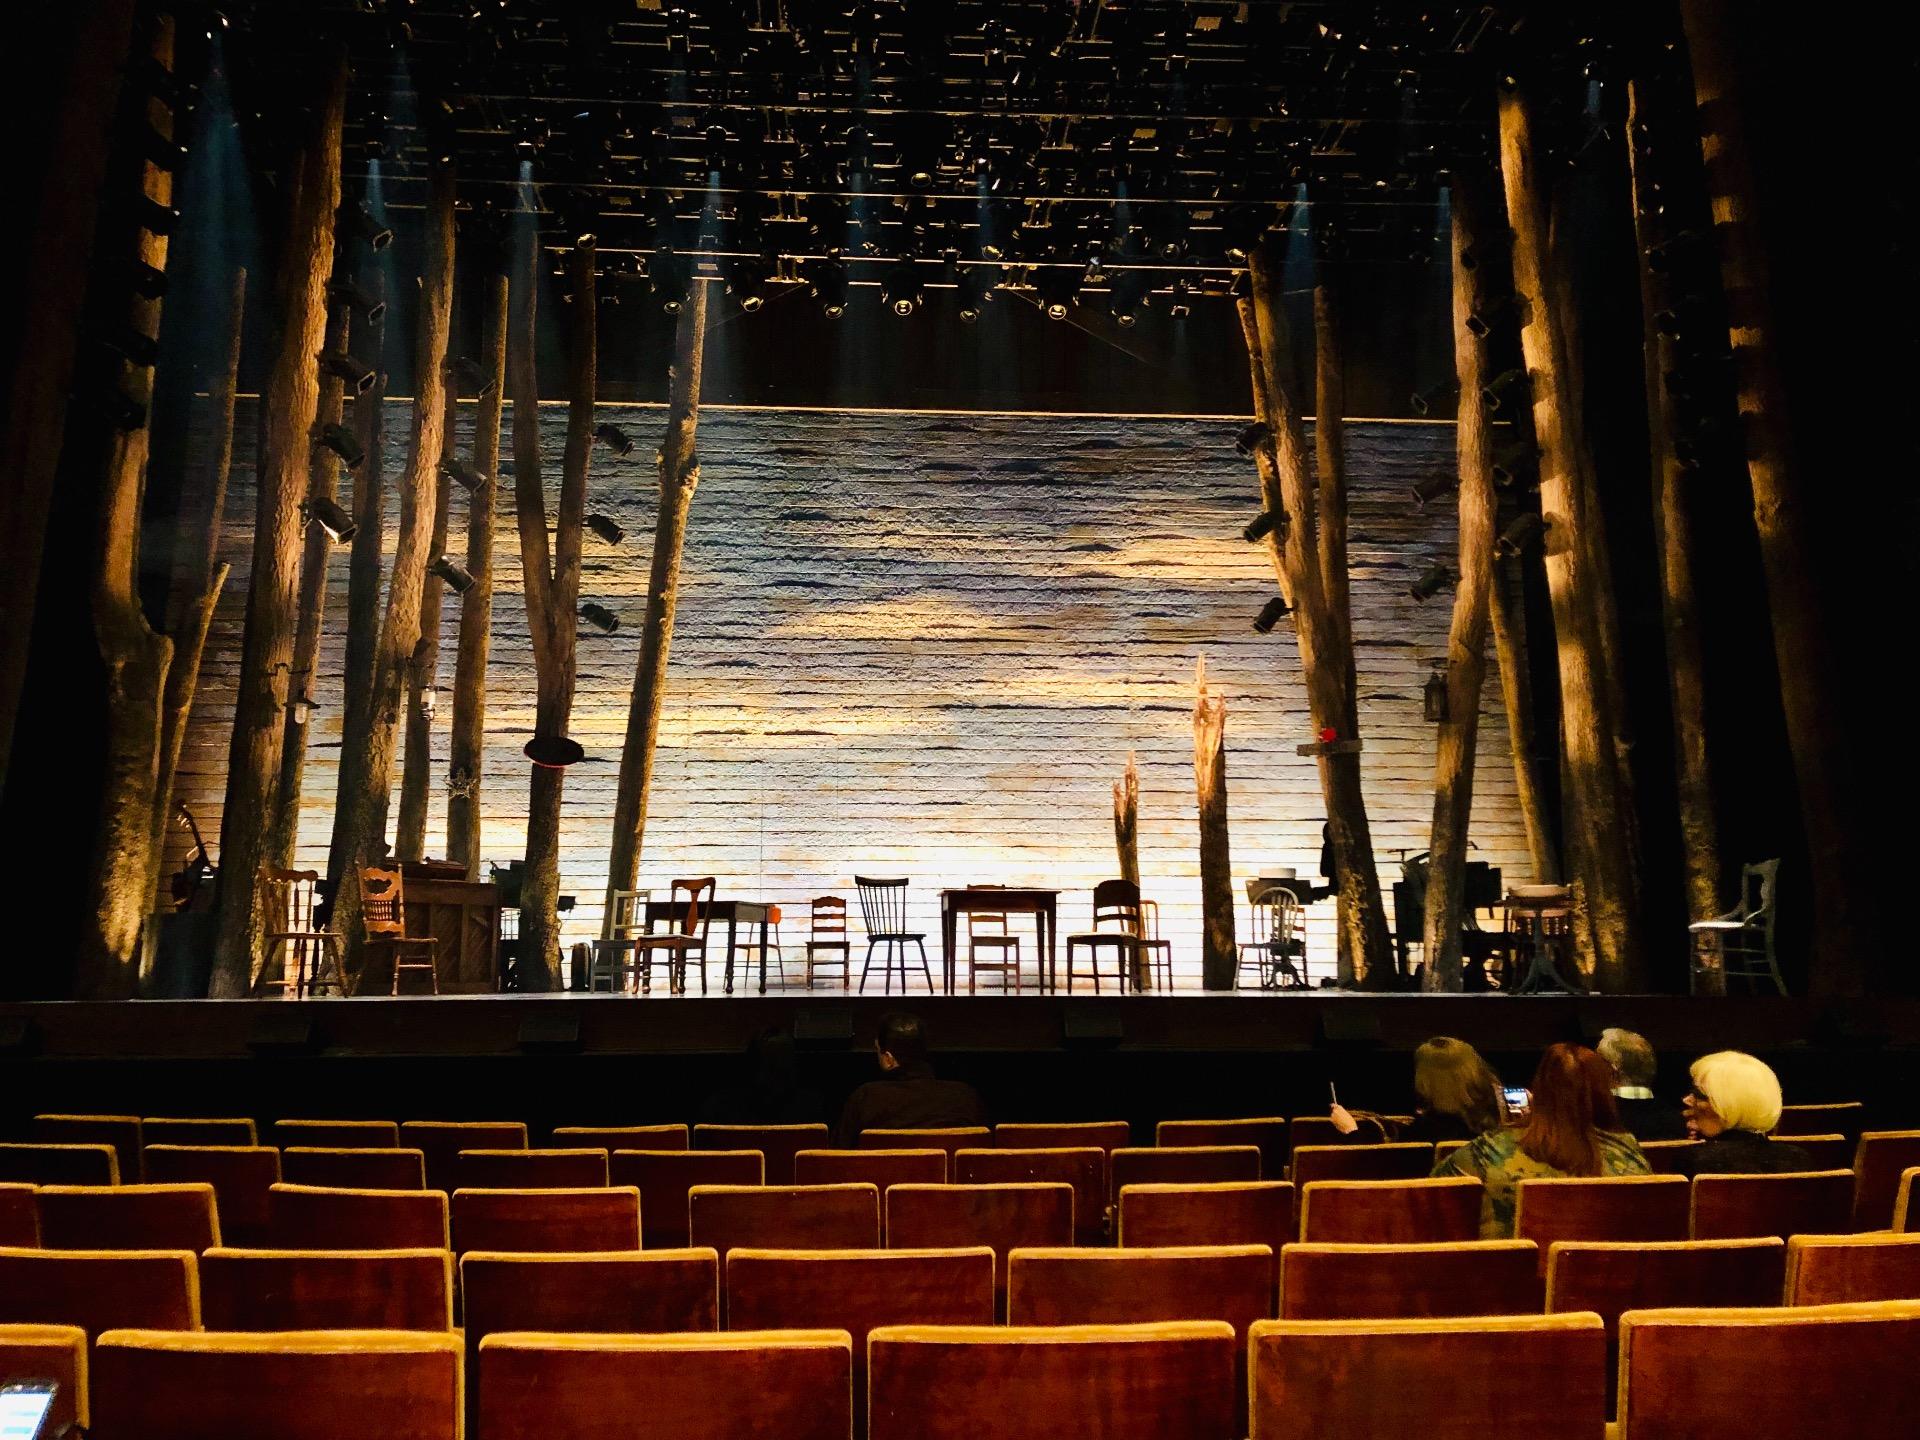 Ahmanson Theatre Section Orchestra Row F Seat 21